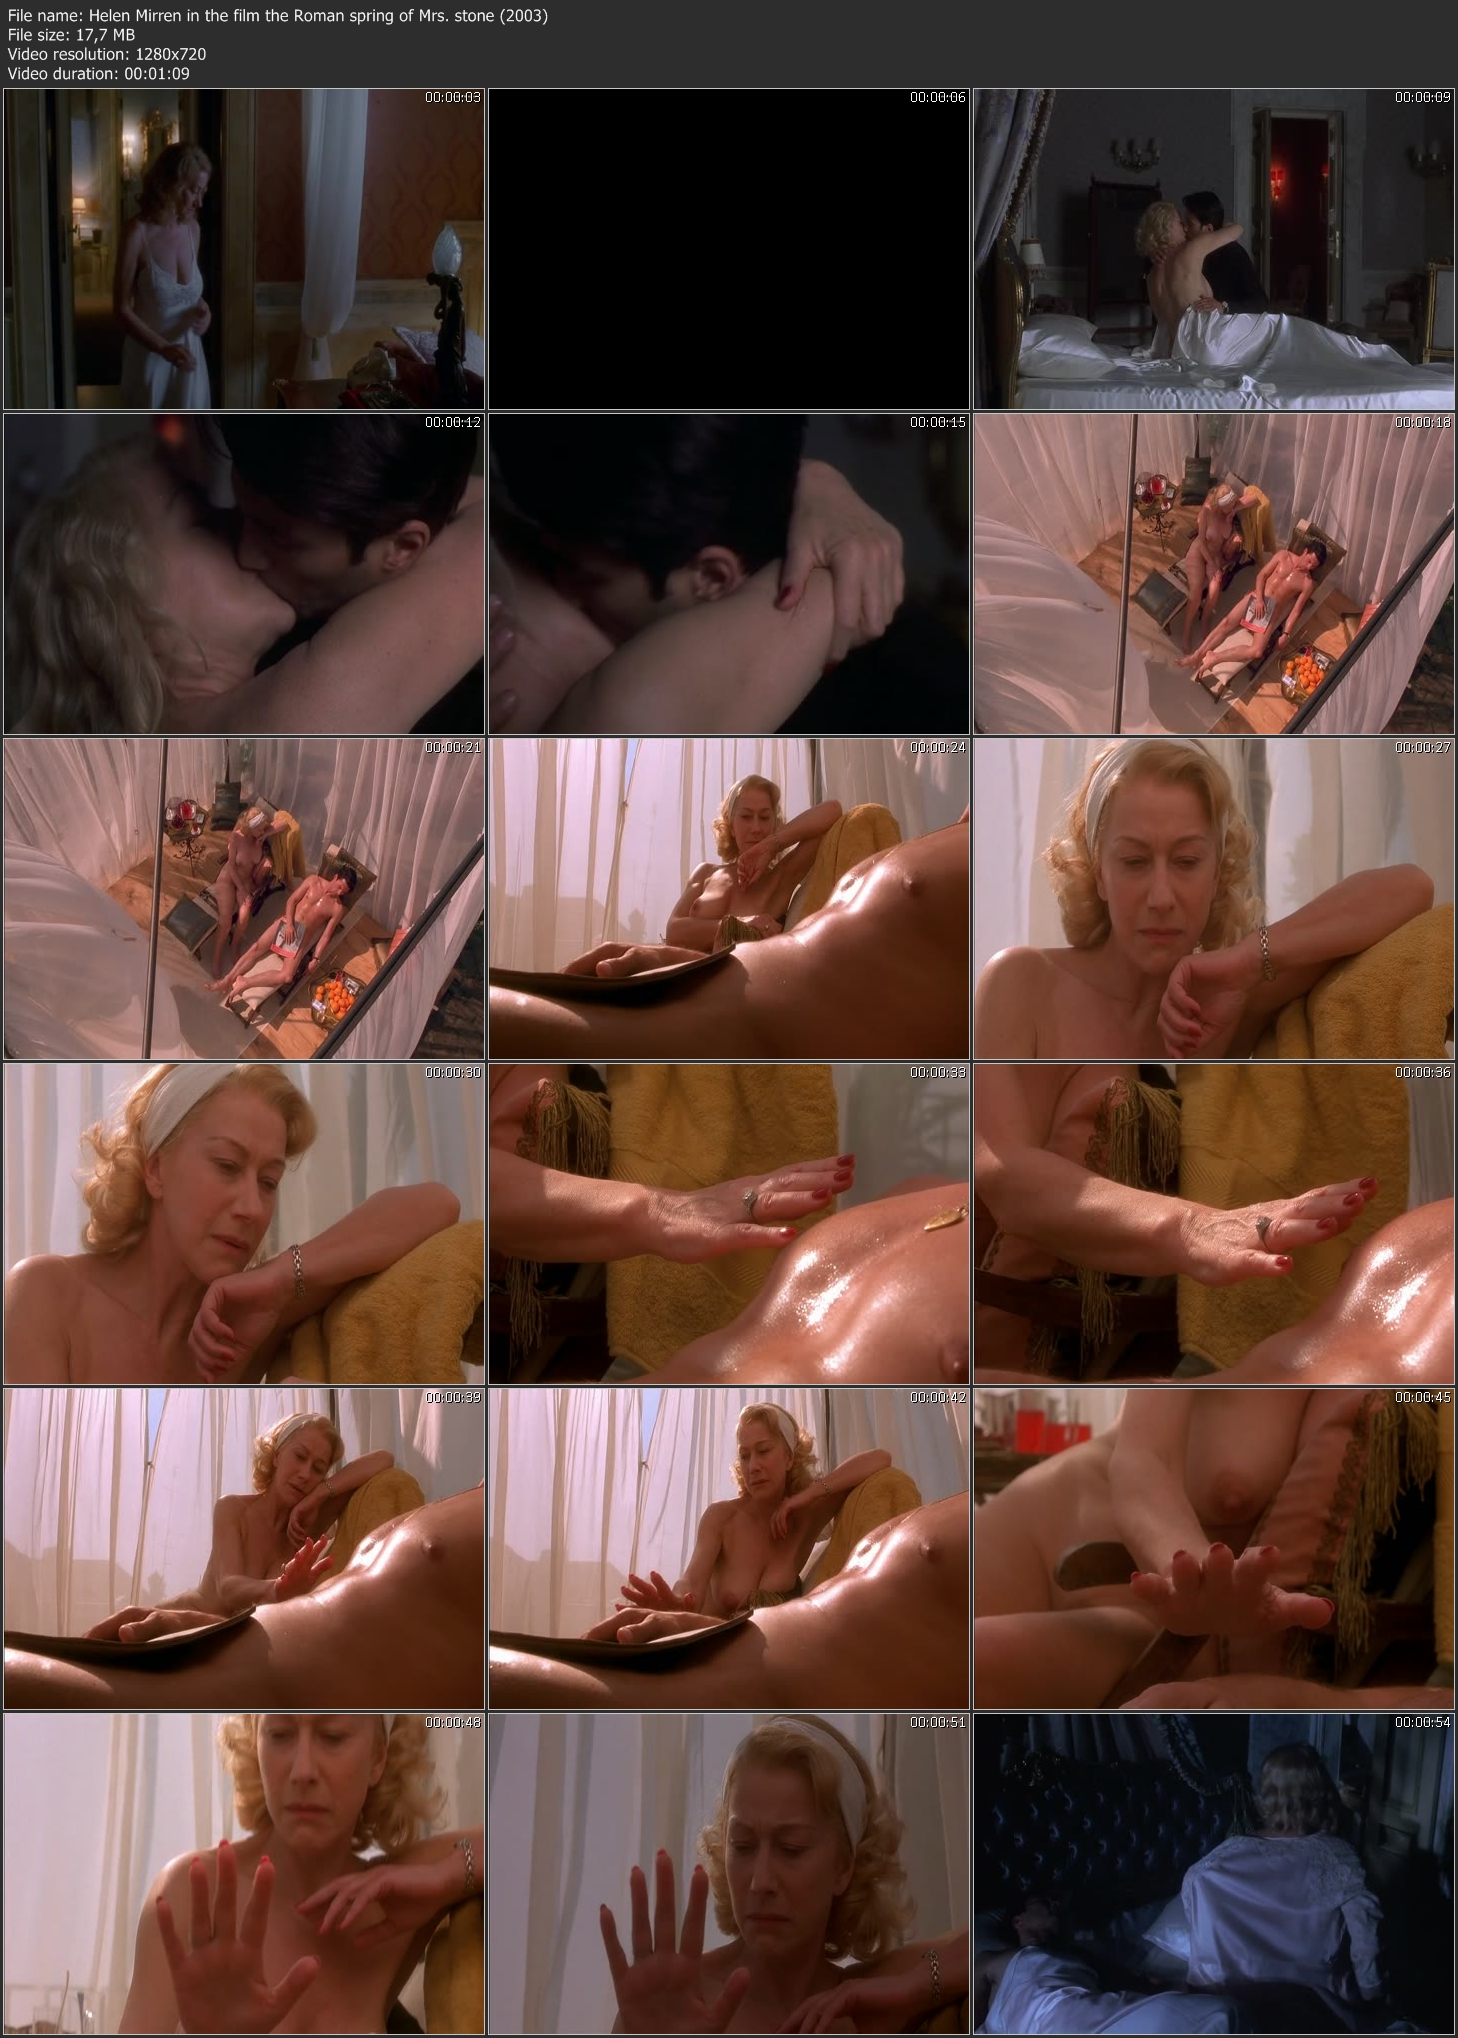 helen mirren in the film the roman spring of mrs. stone (2003) (image 2),